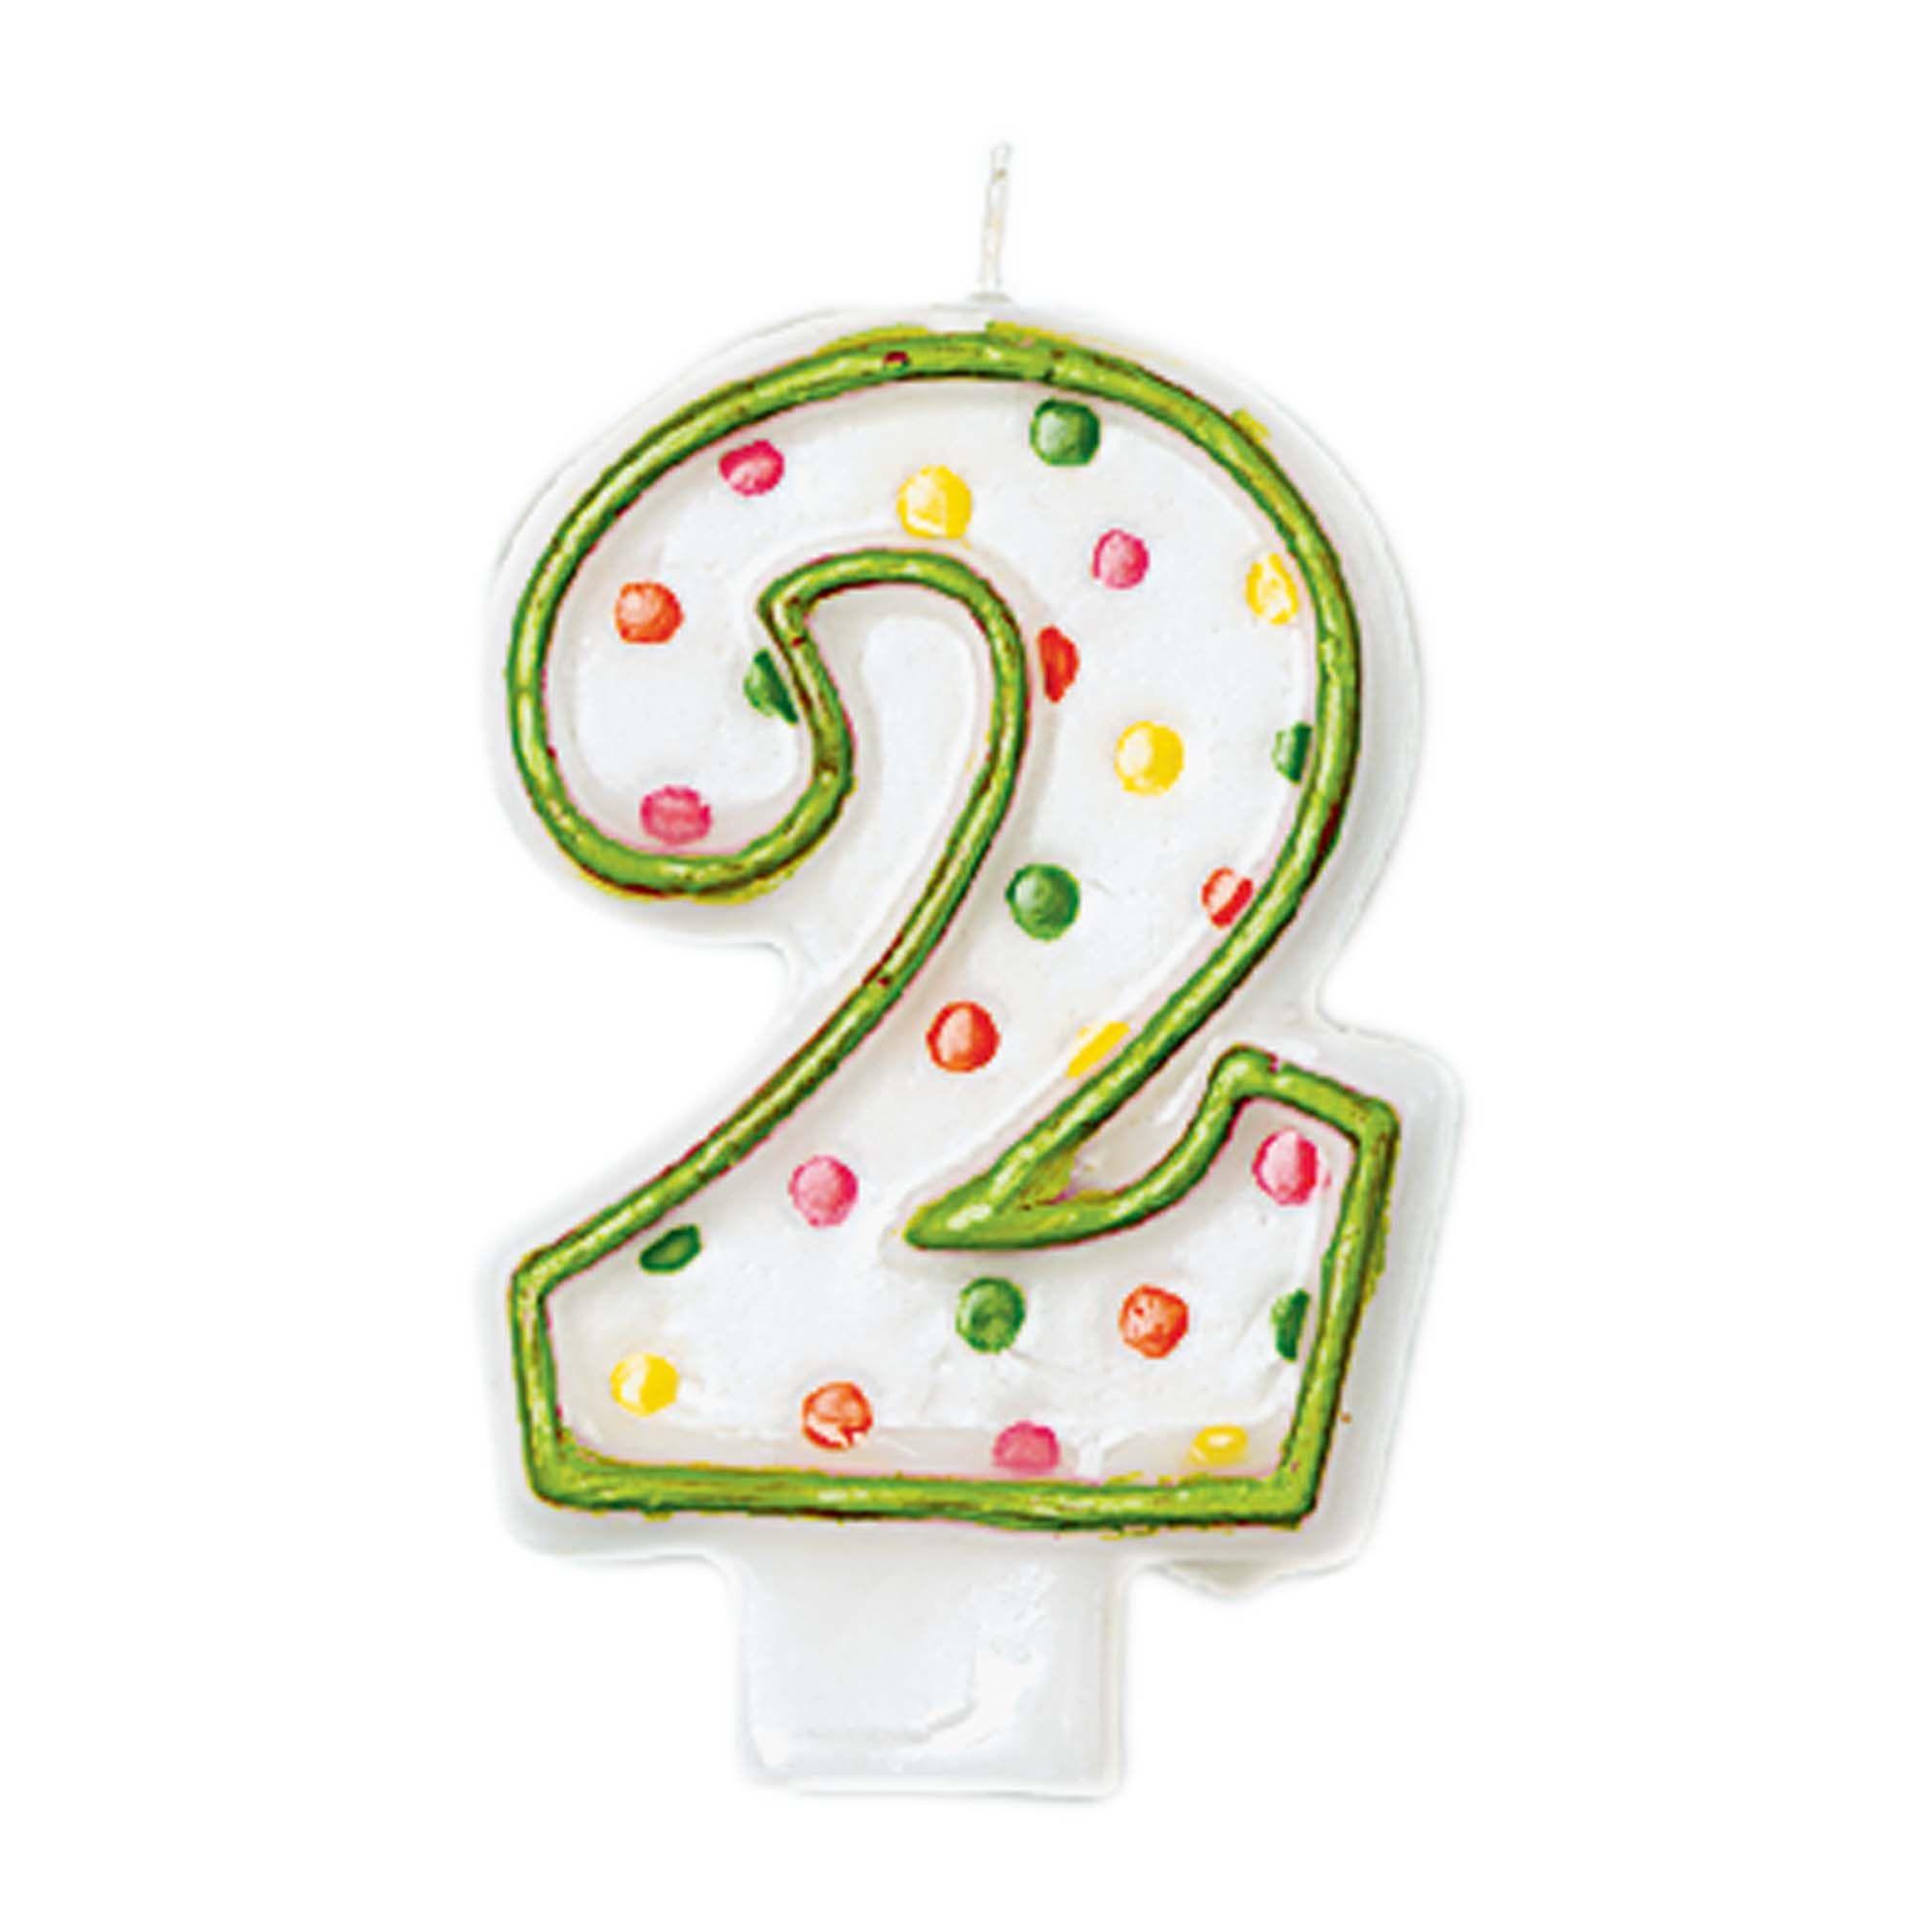 #2 Polka Dot Candle